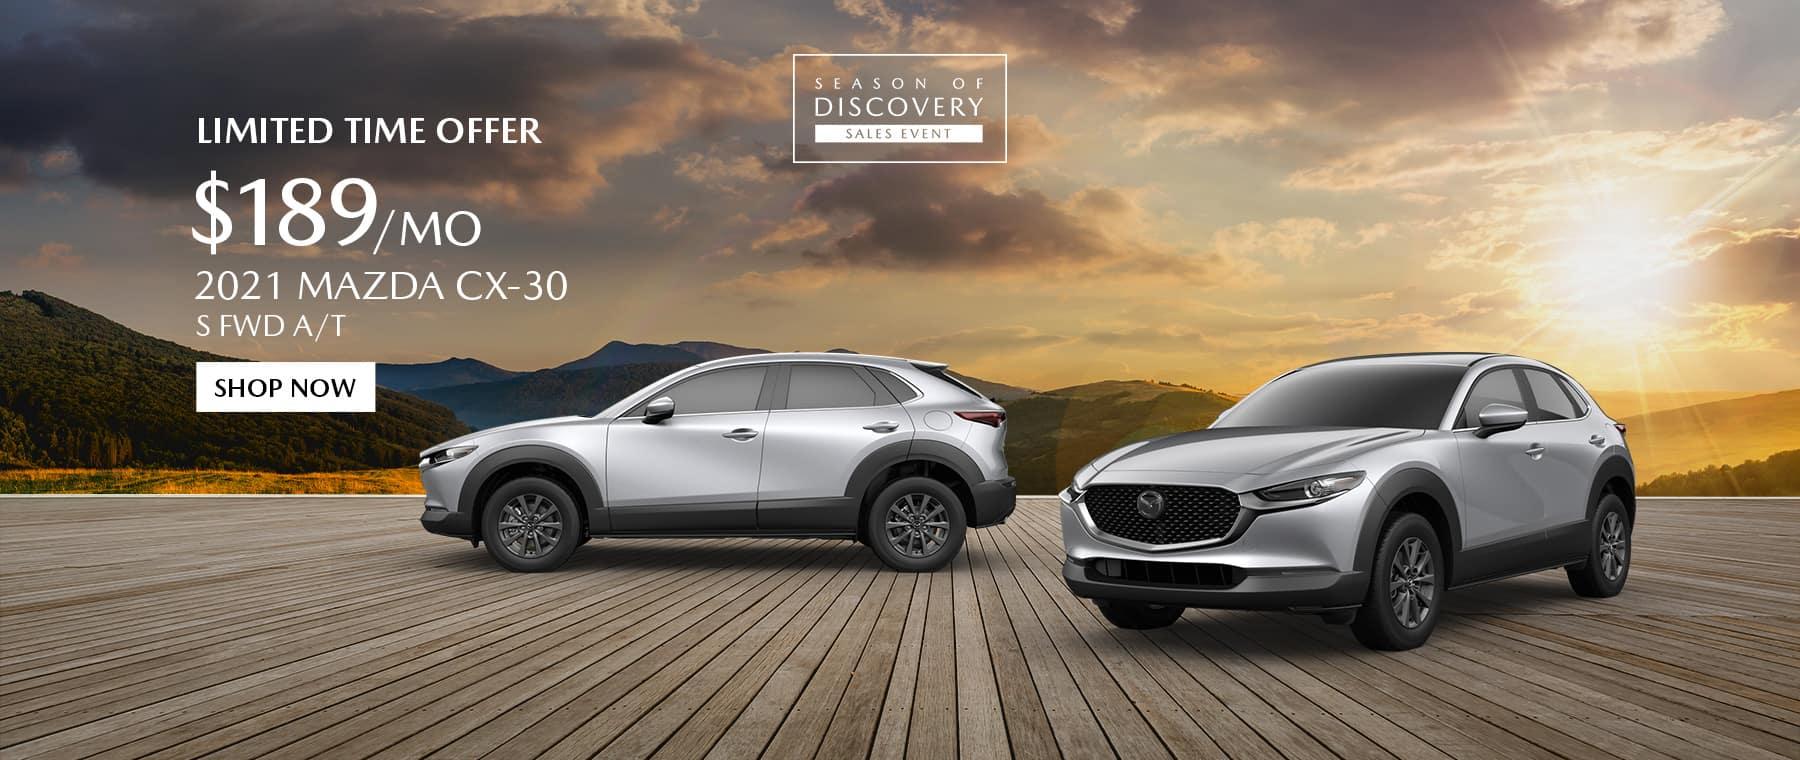 2021 Mazda CX-30 Special Offer